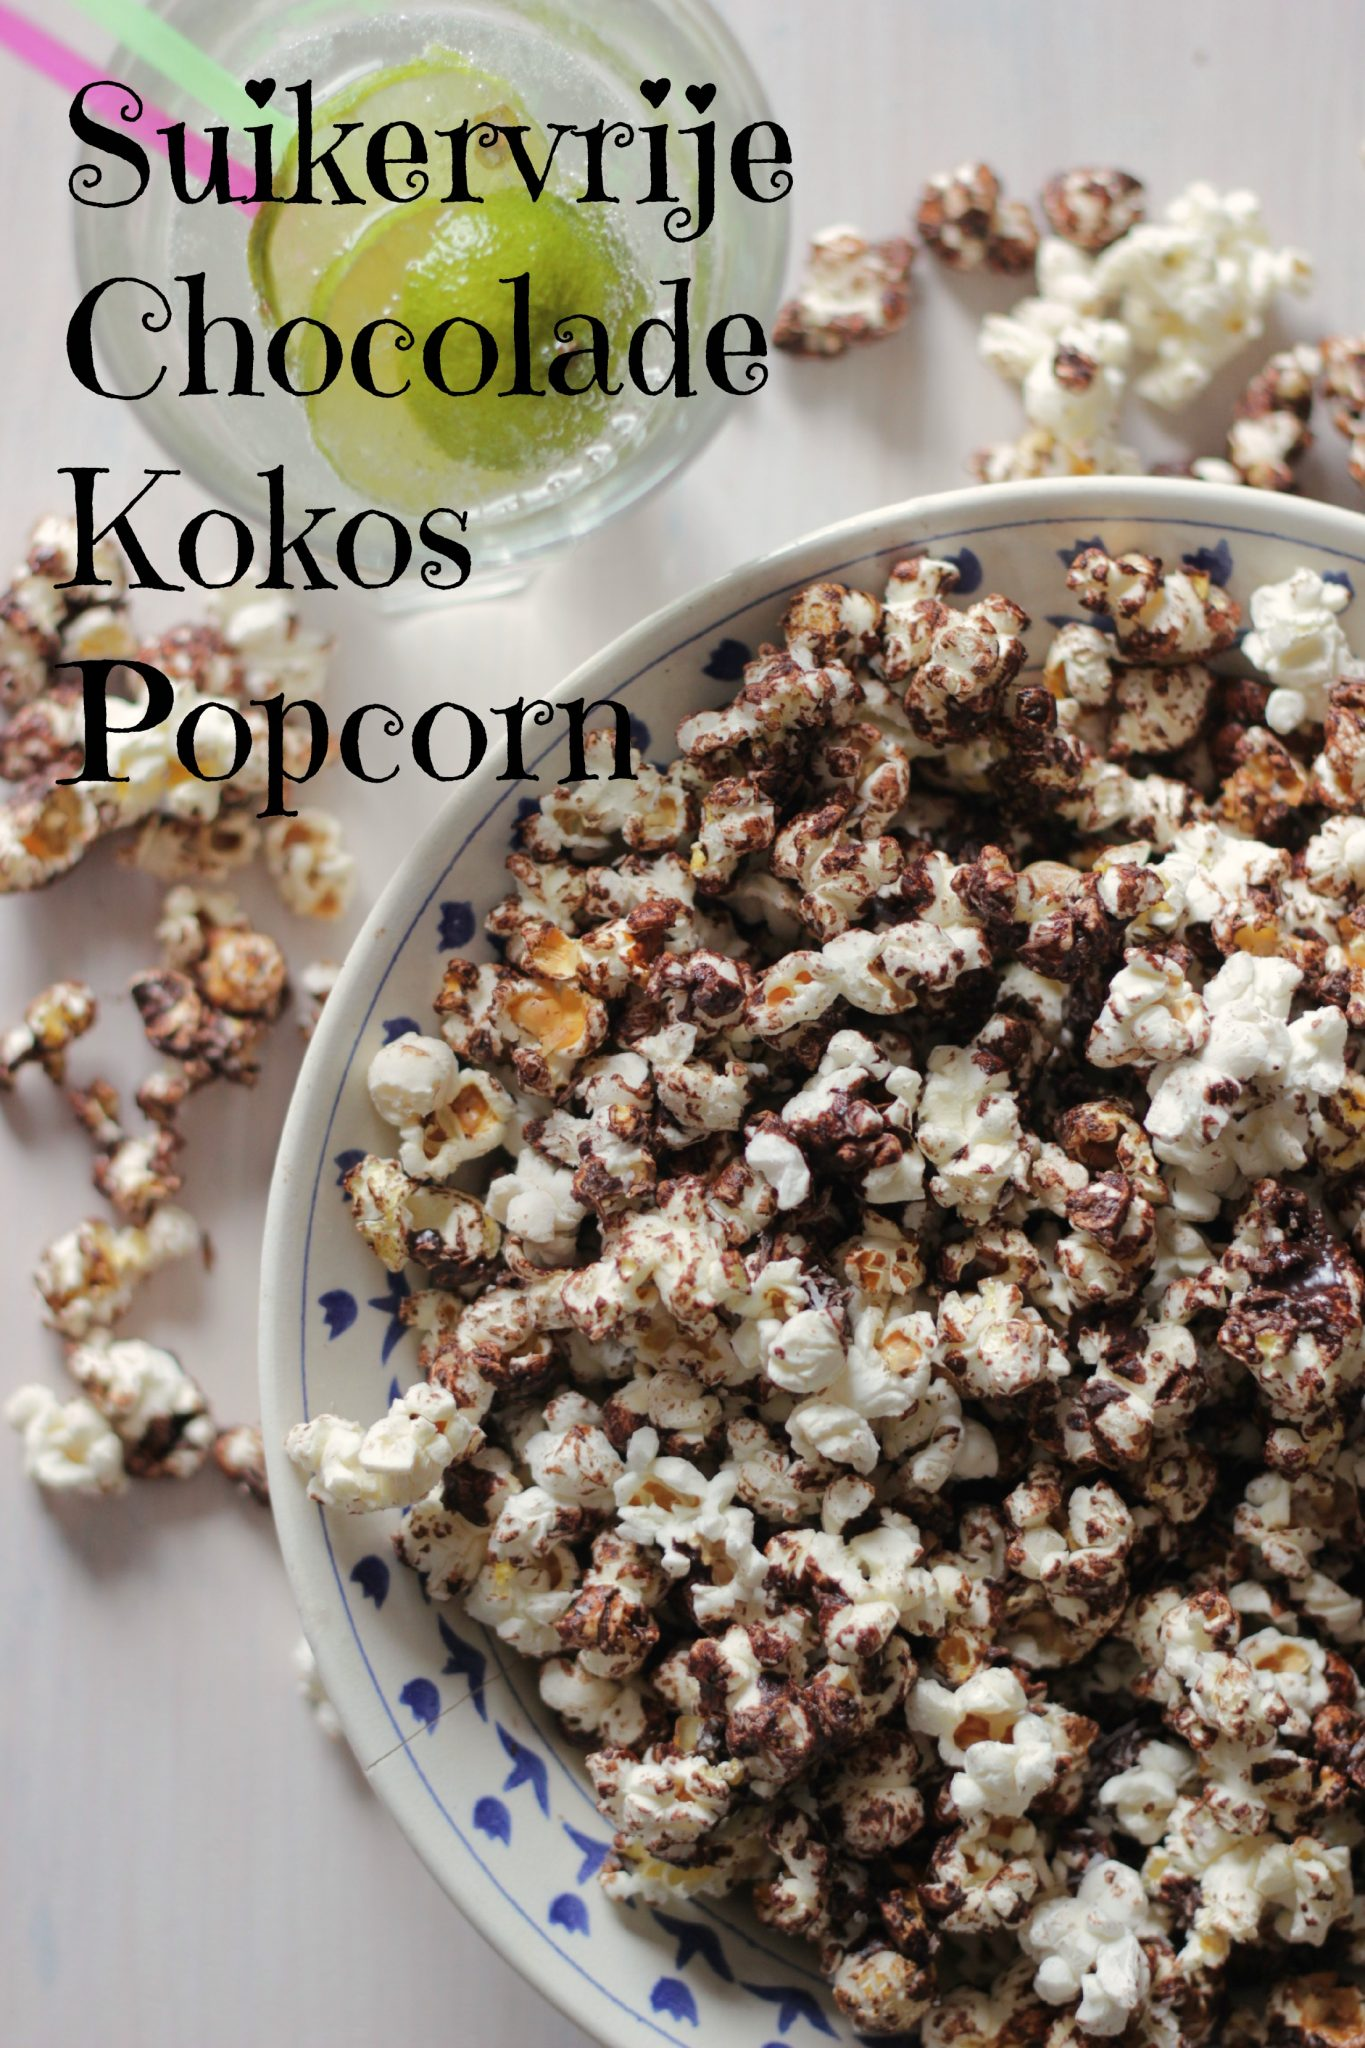 Suikervrije Chocolade Kokos Popcorn